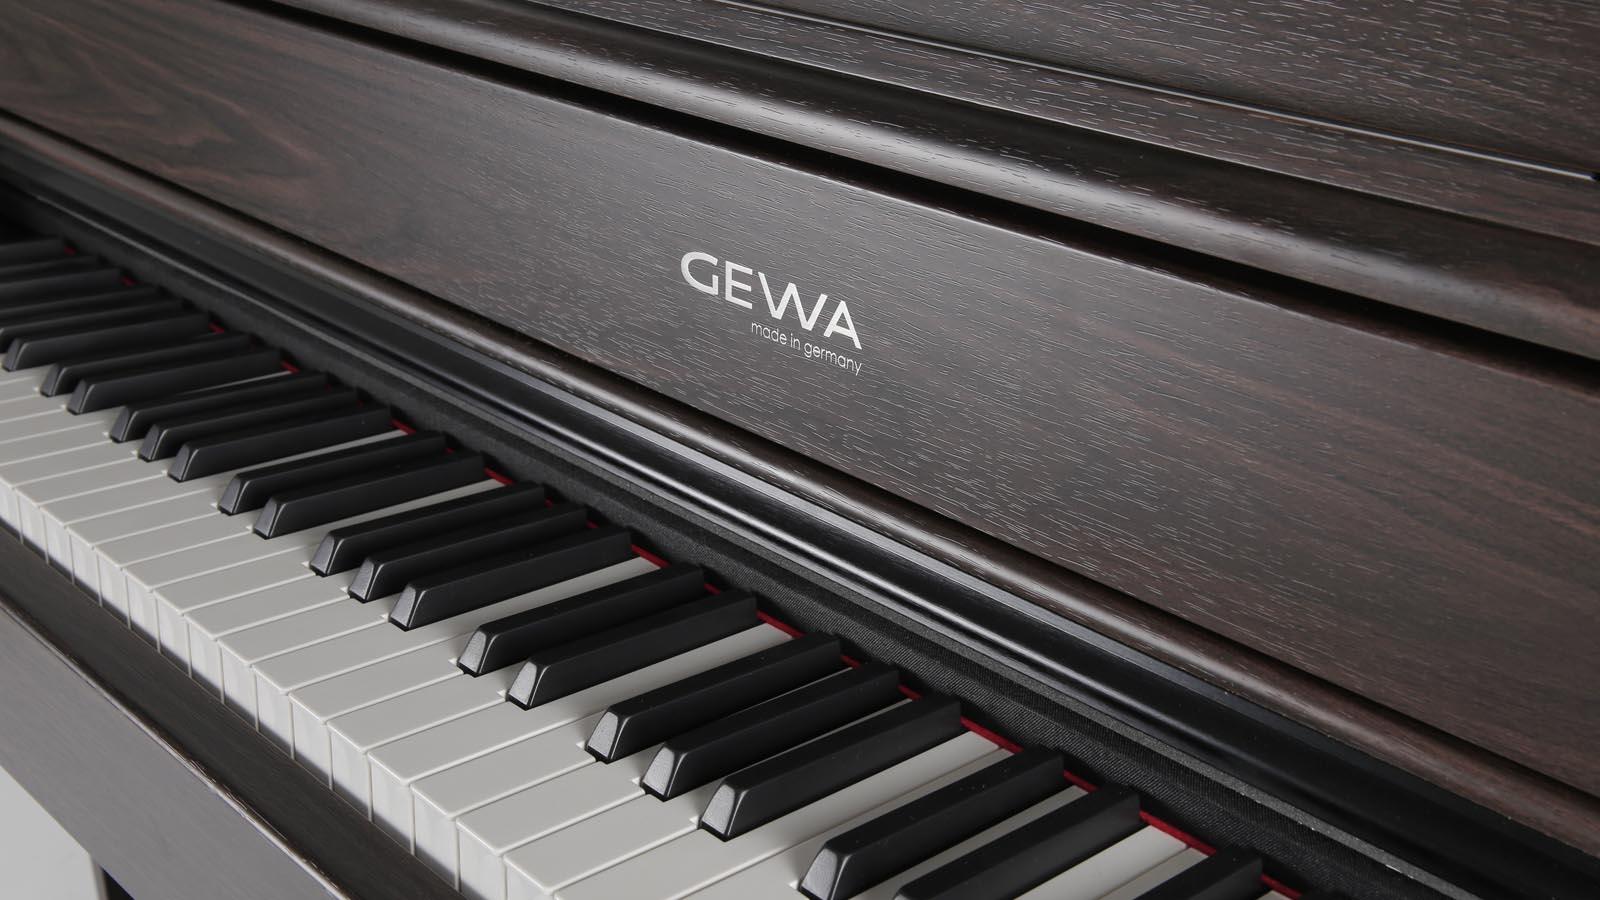 Gewa UP380WK RW E-Piano Rosewood matt Holztasten